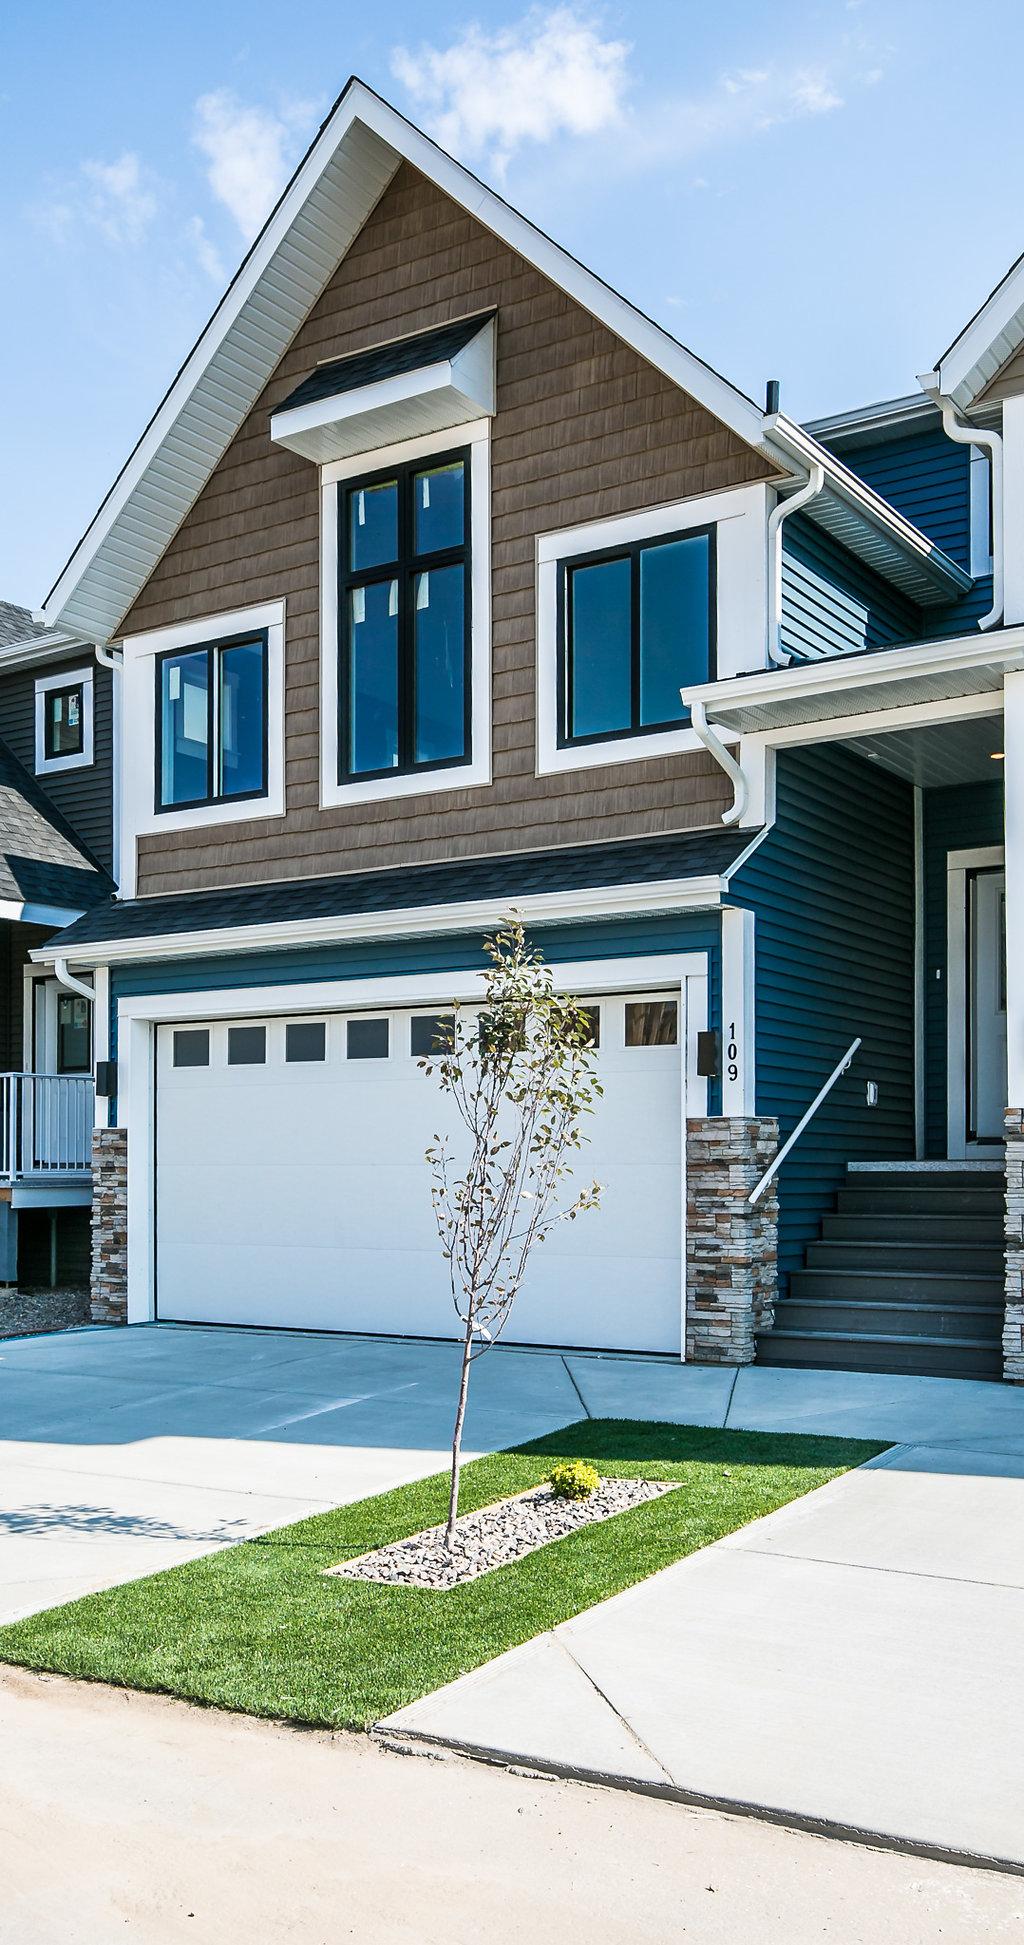 #106-900 St. Andrews Lane Warman, Saskatchewan